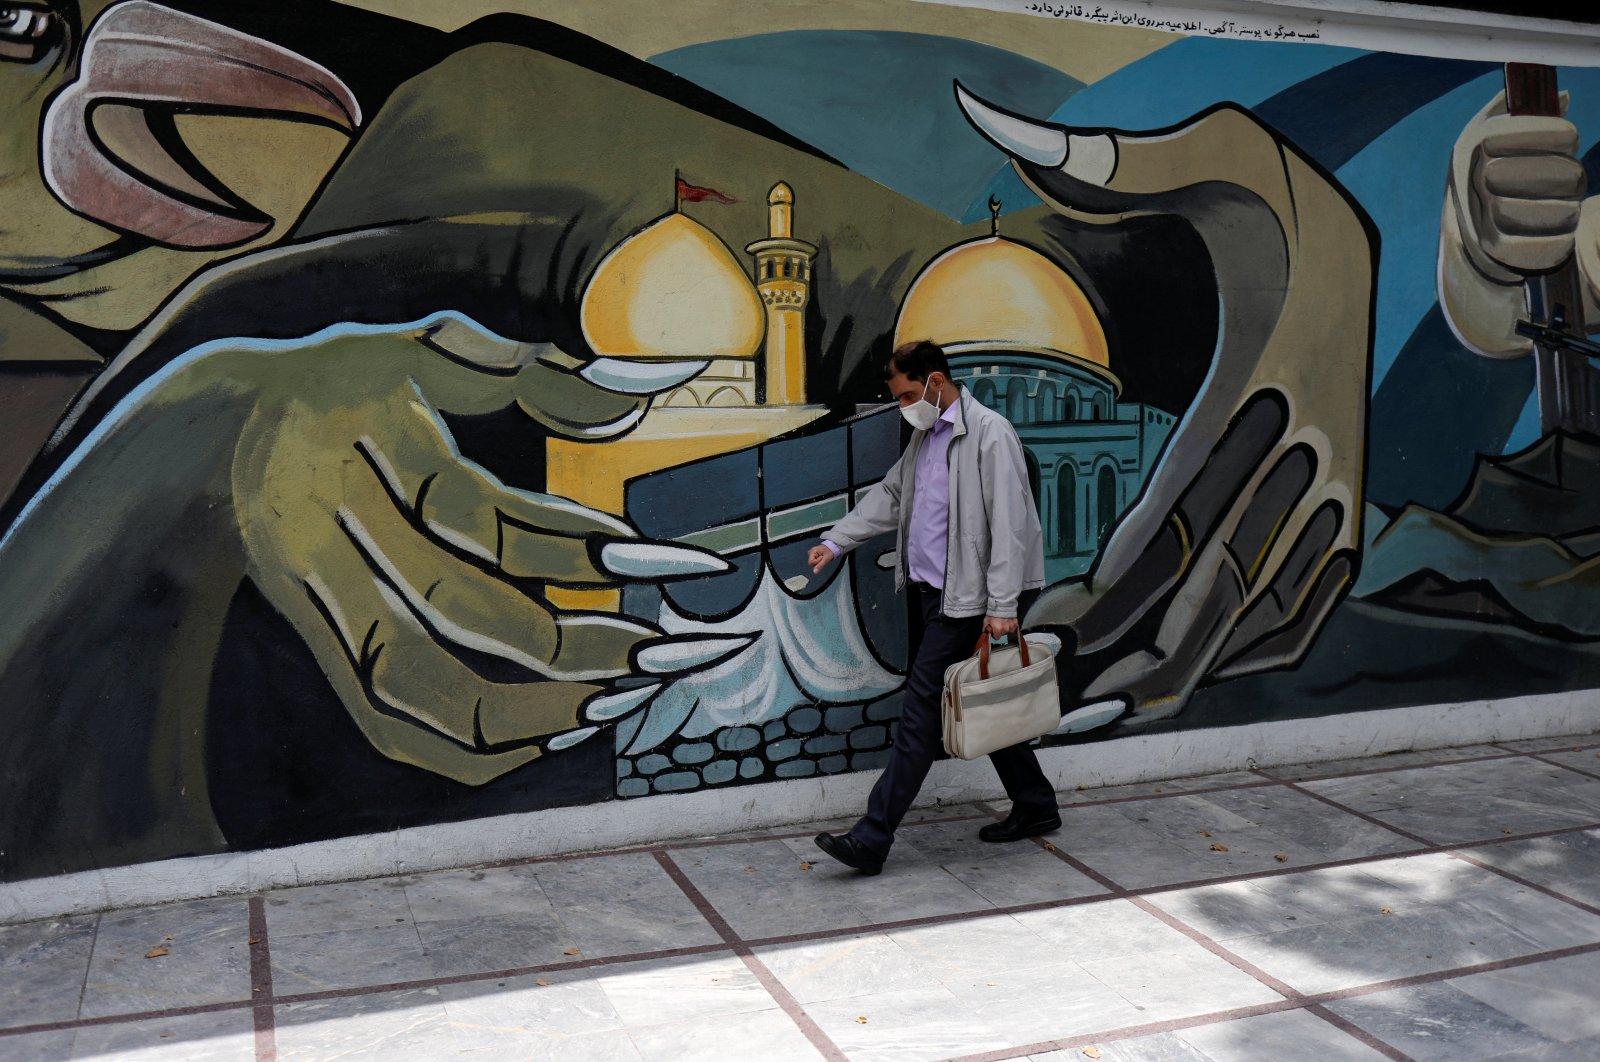 A man wearing a protective face mask walks past a Palestine mural on the wall following the outbreak of the coronavirus, Tehran, Iran, April 30, 2020. (WANA / Ali Khara via REUTERS)